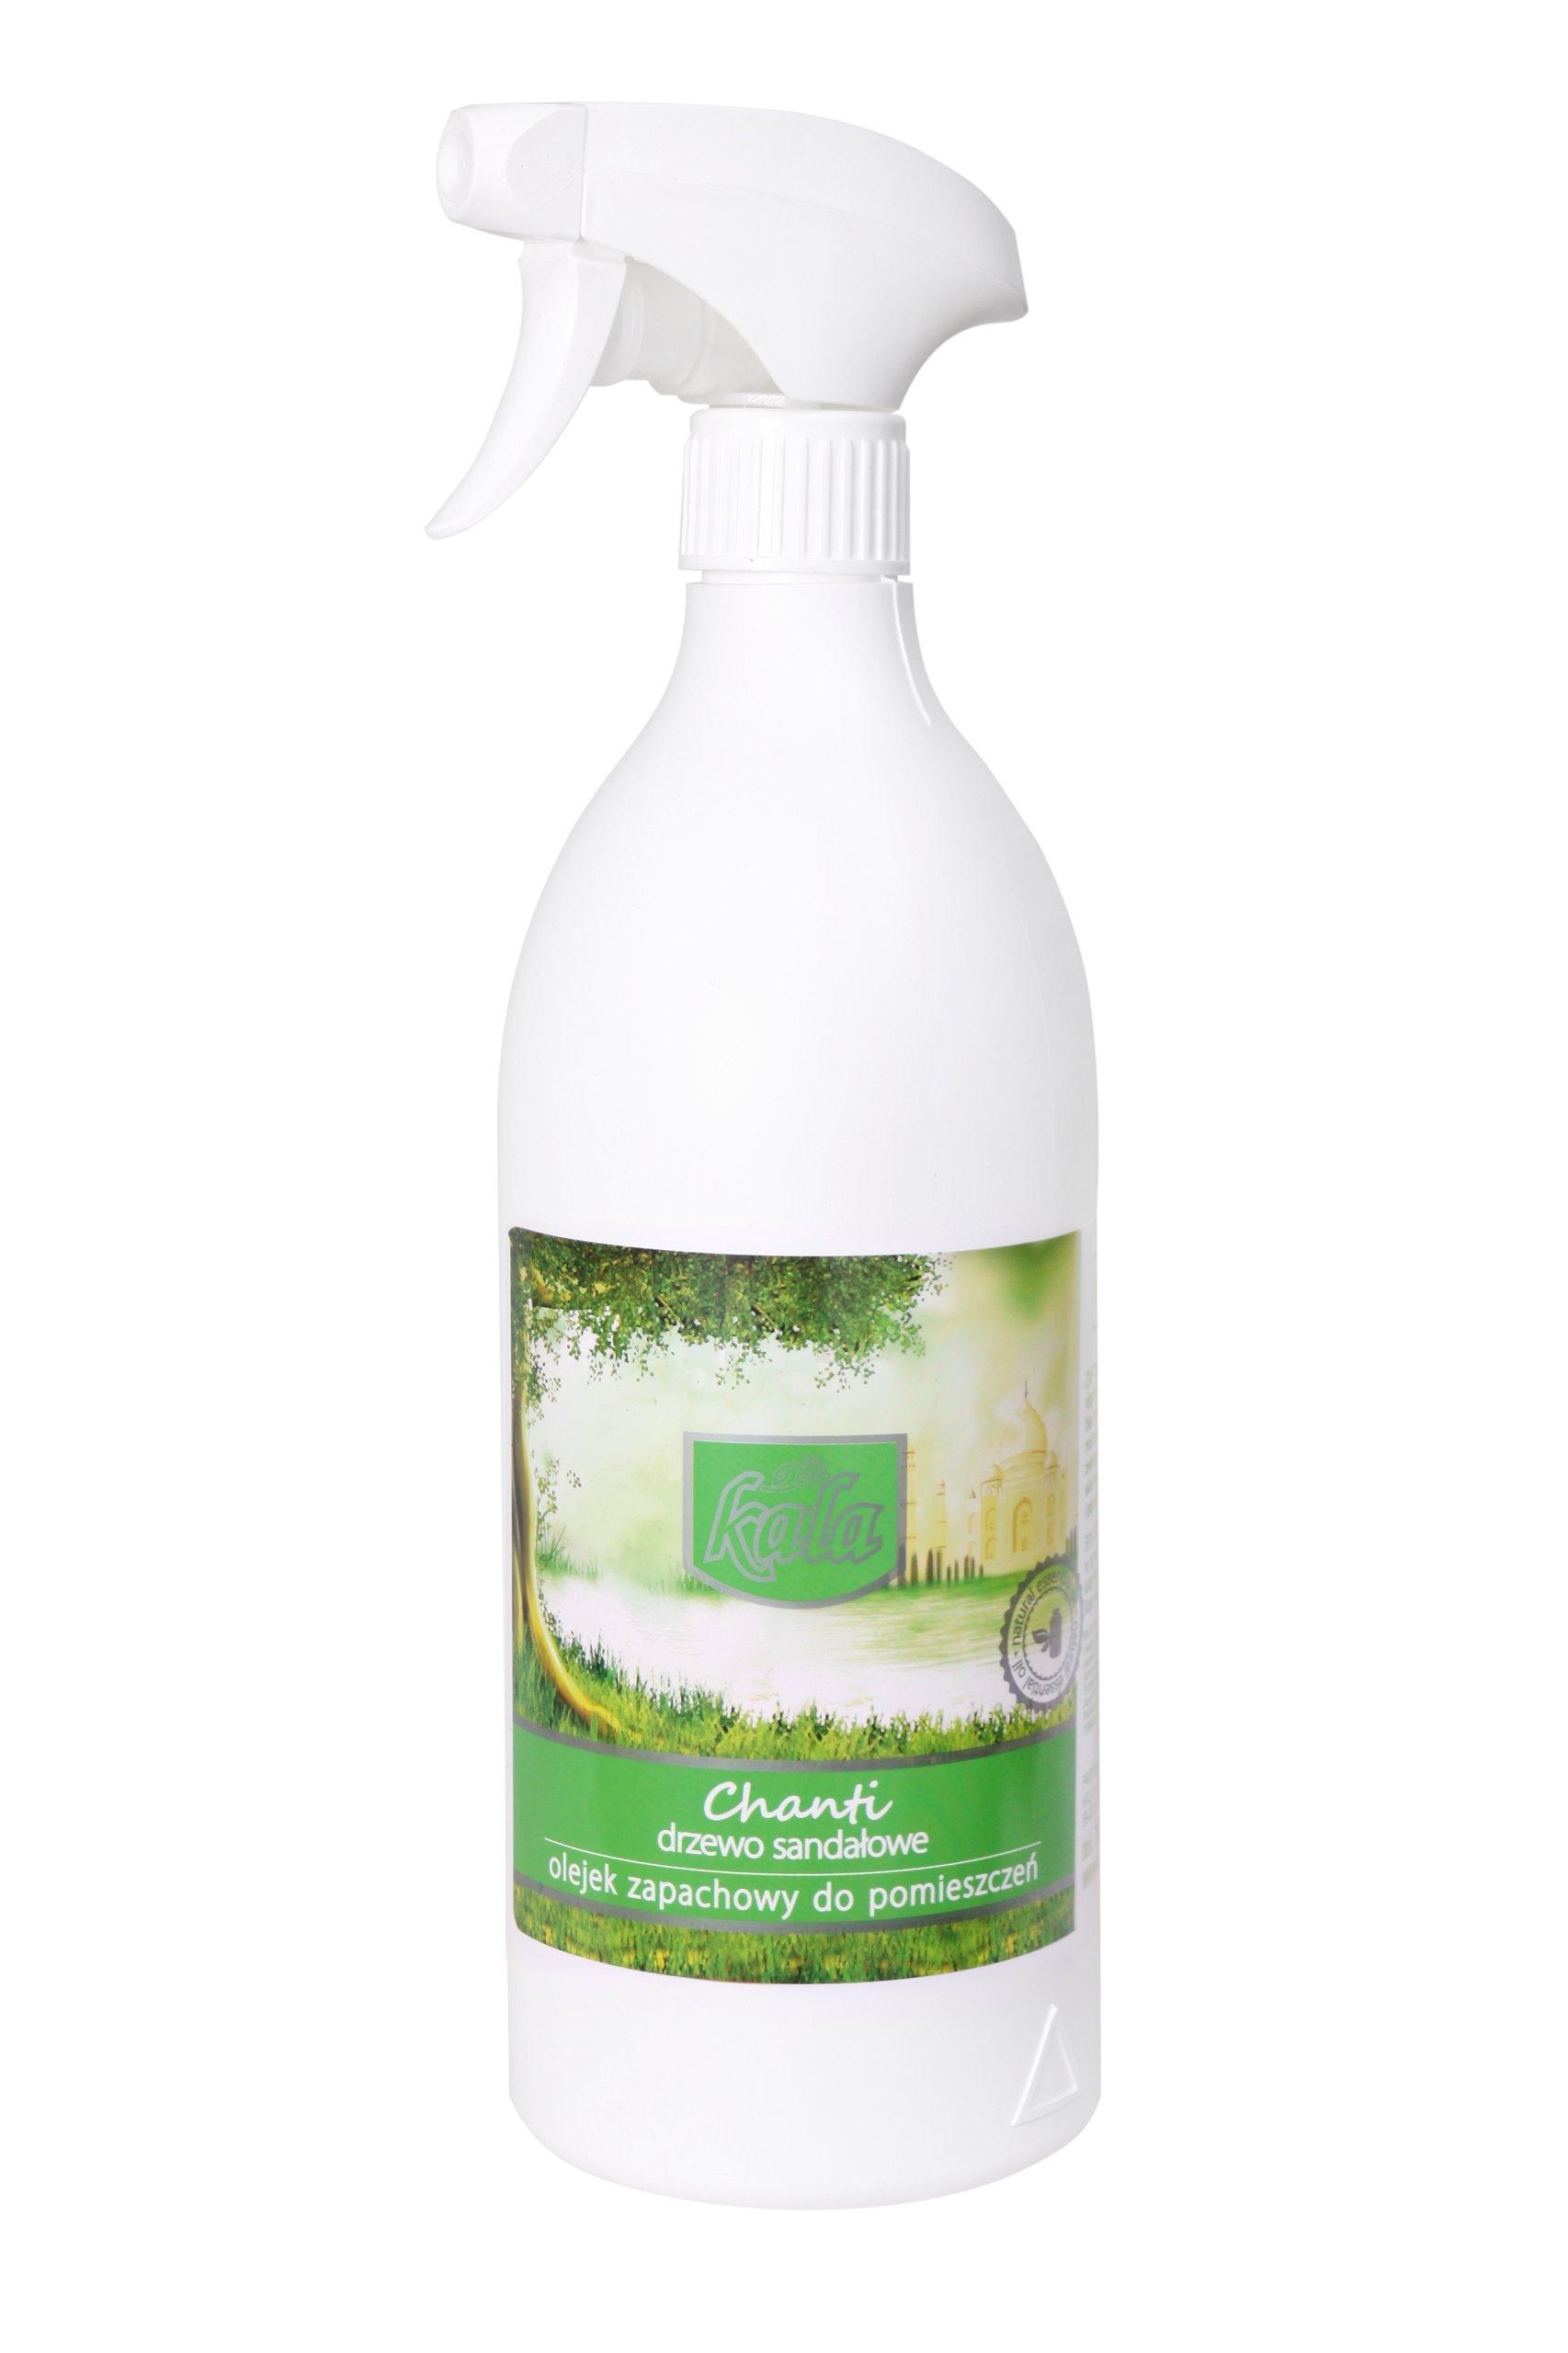 KALA CHANTI эфирное масло аромат. Сандаловое дерево 500 мл